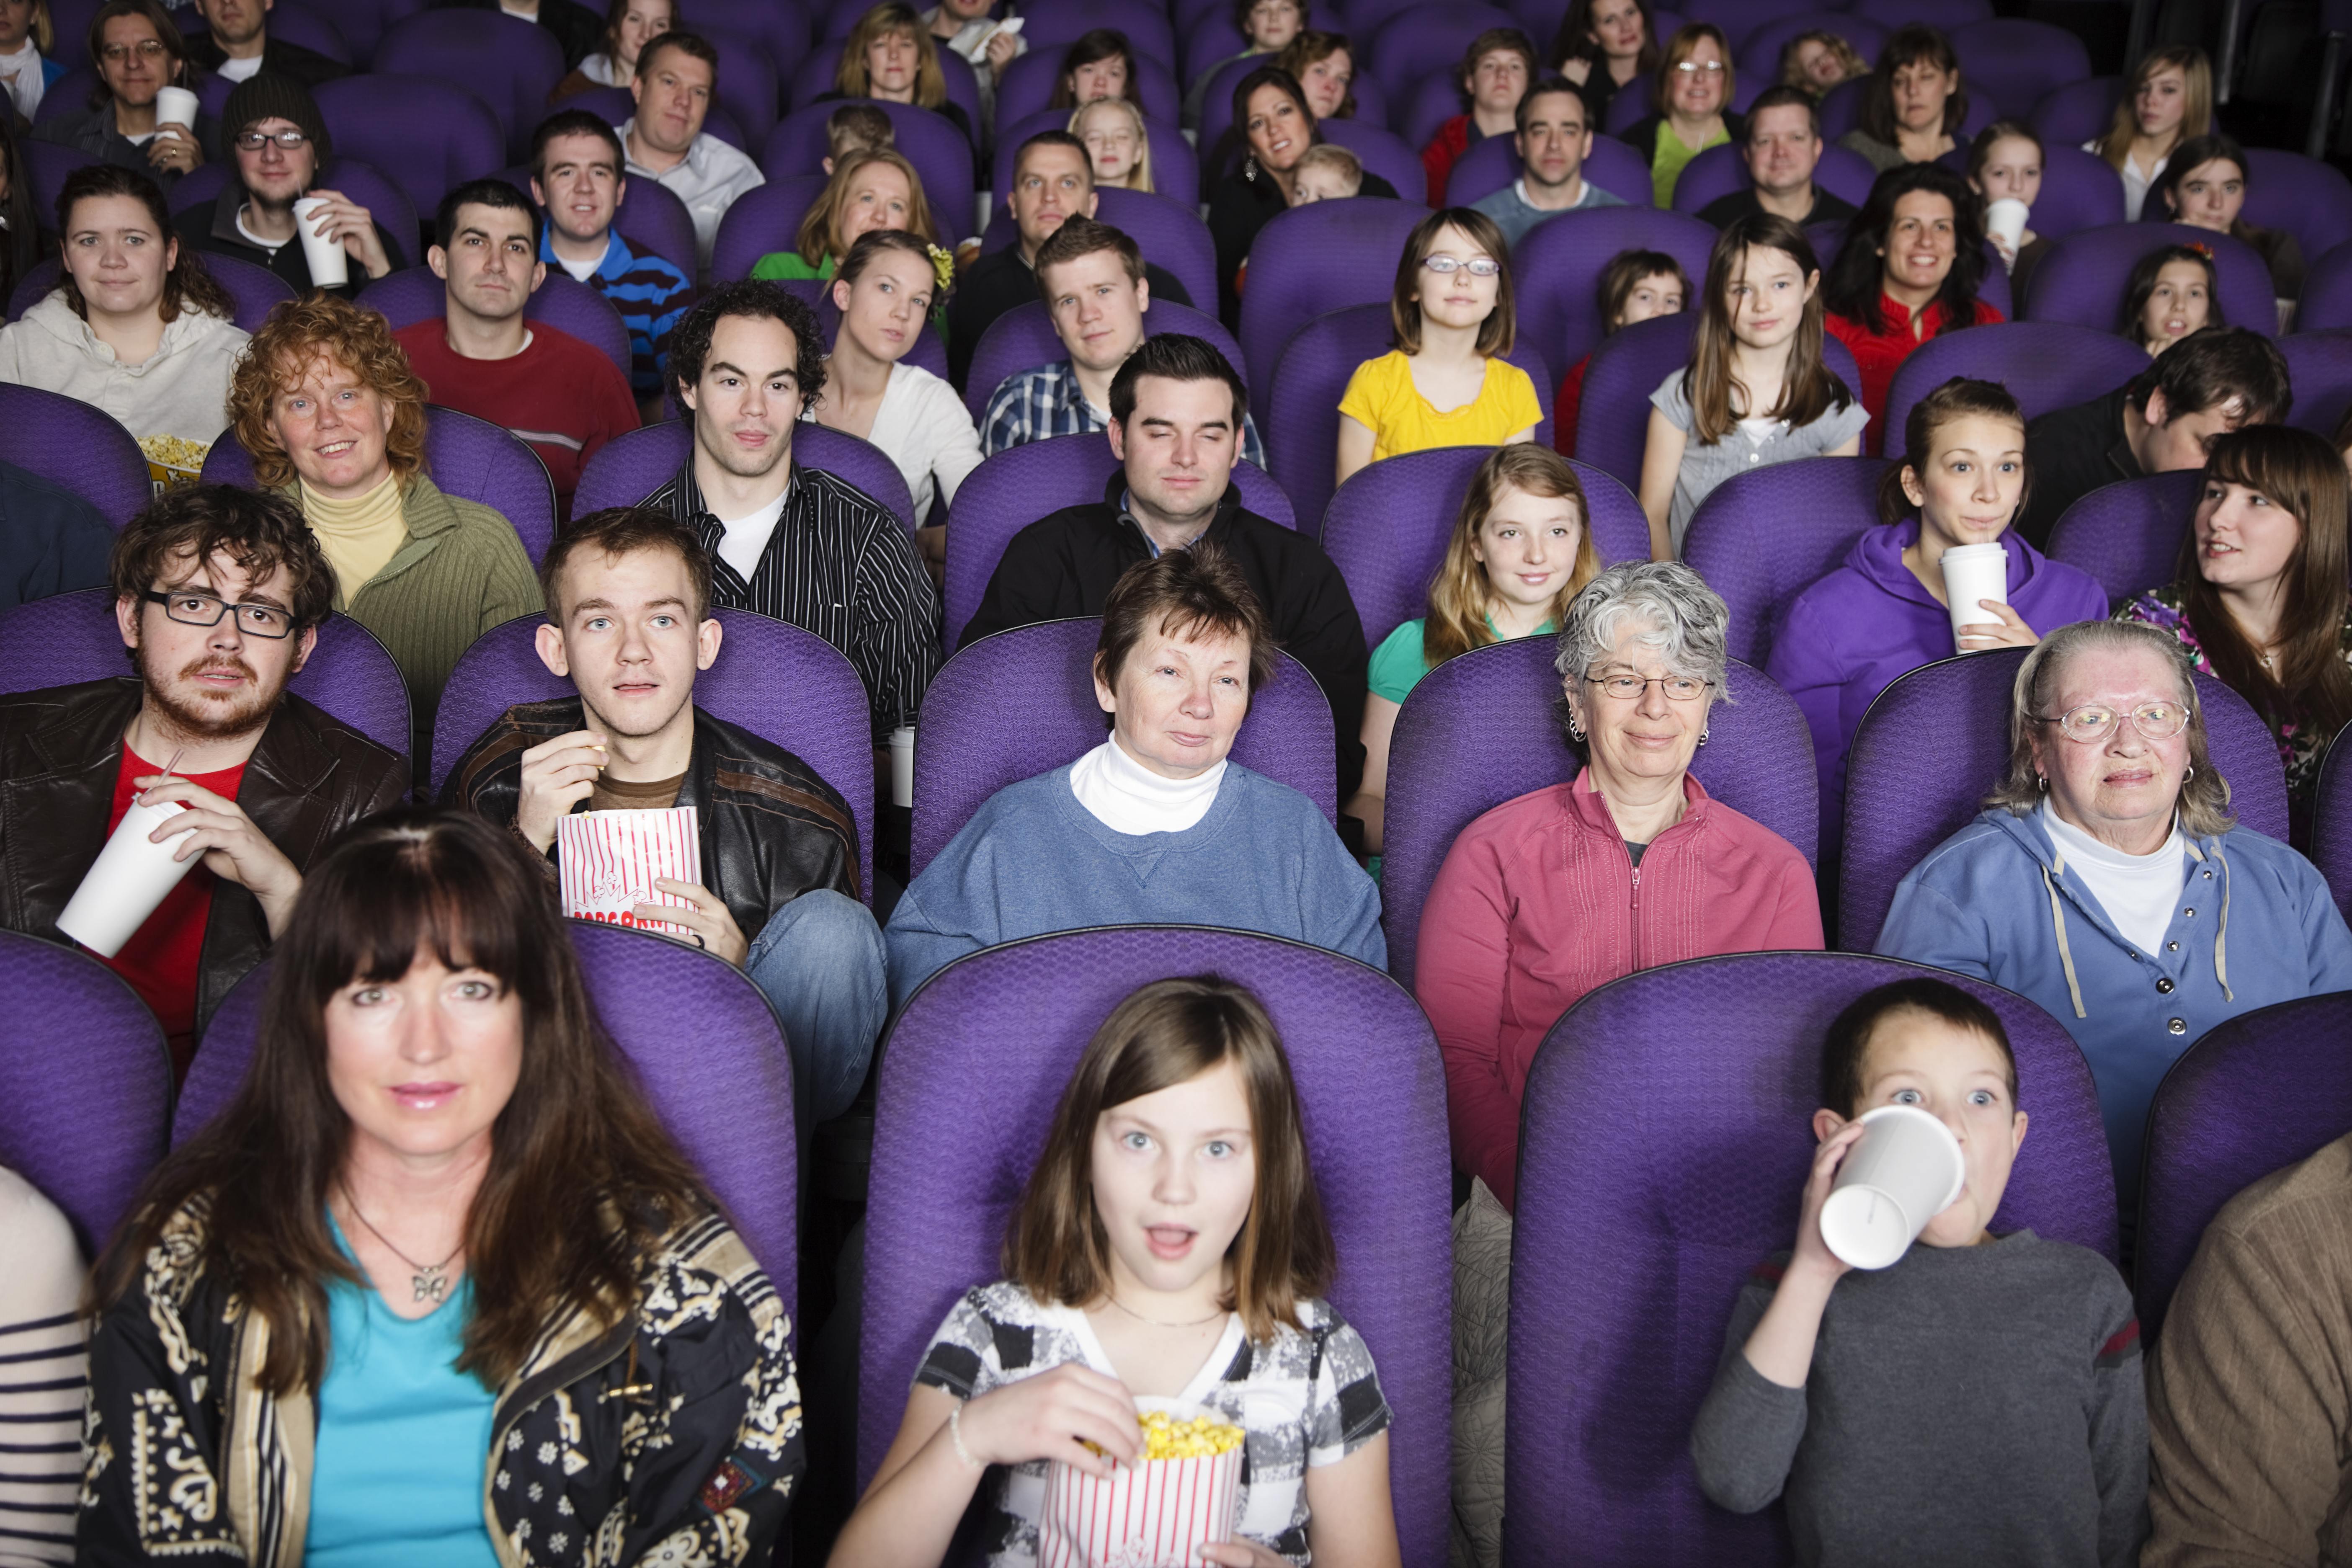 foto av publikum i en kinosal